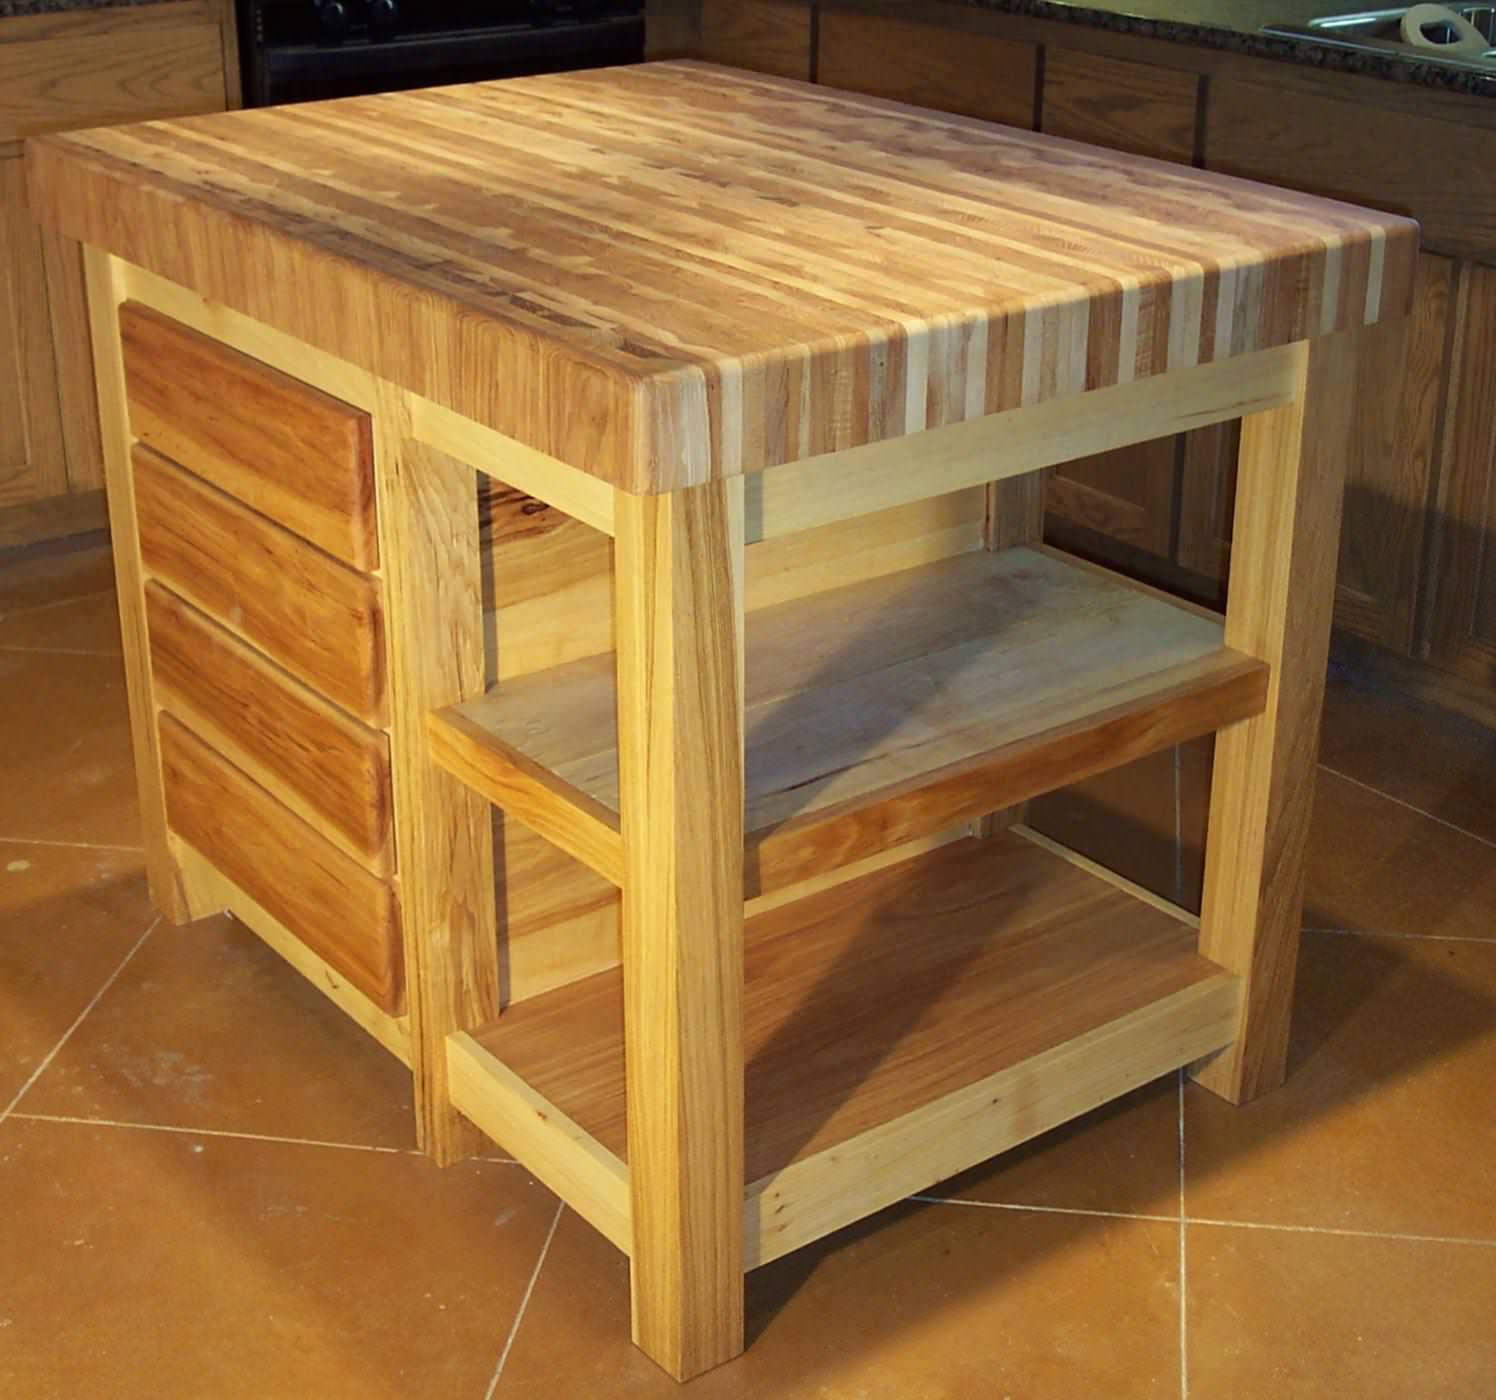 Pecan / Hickory butcher block counter tops